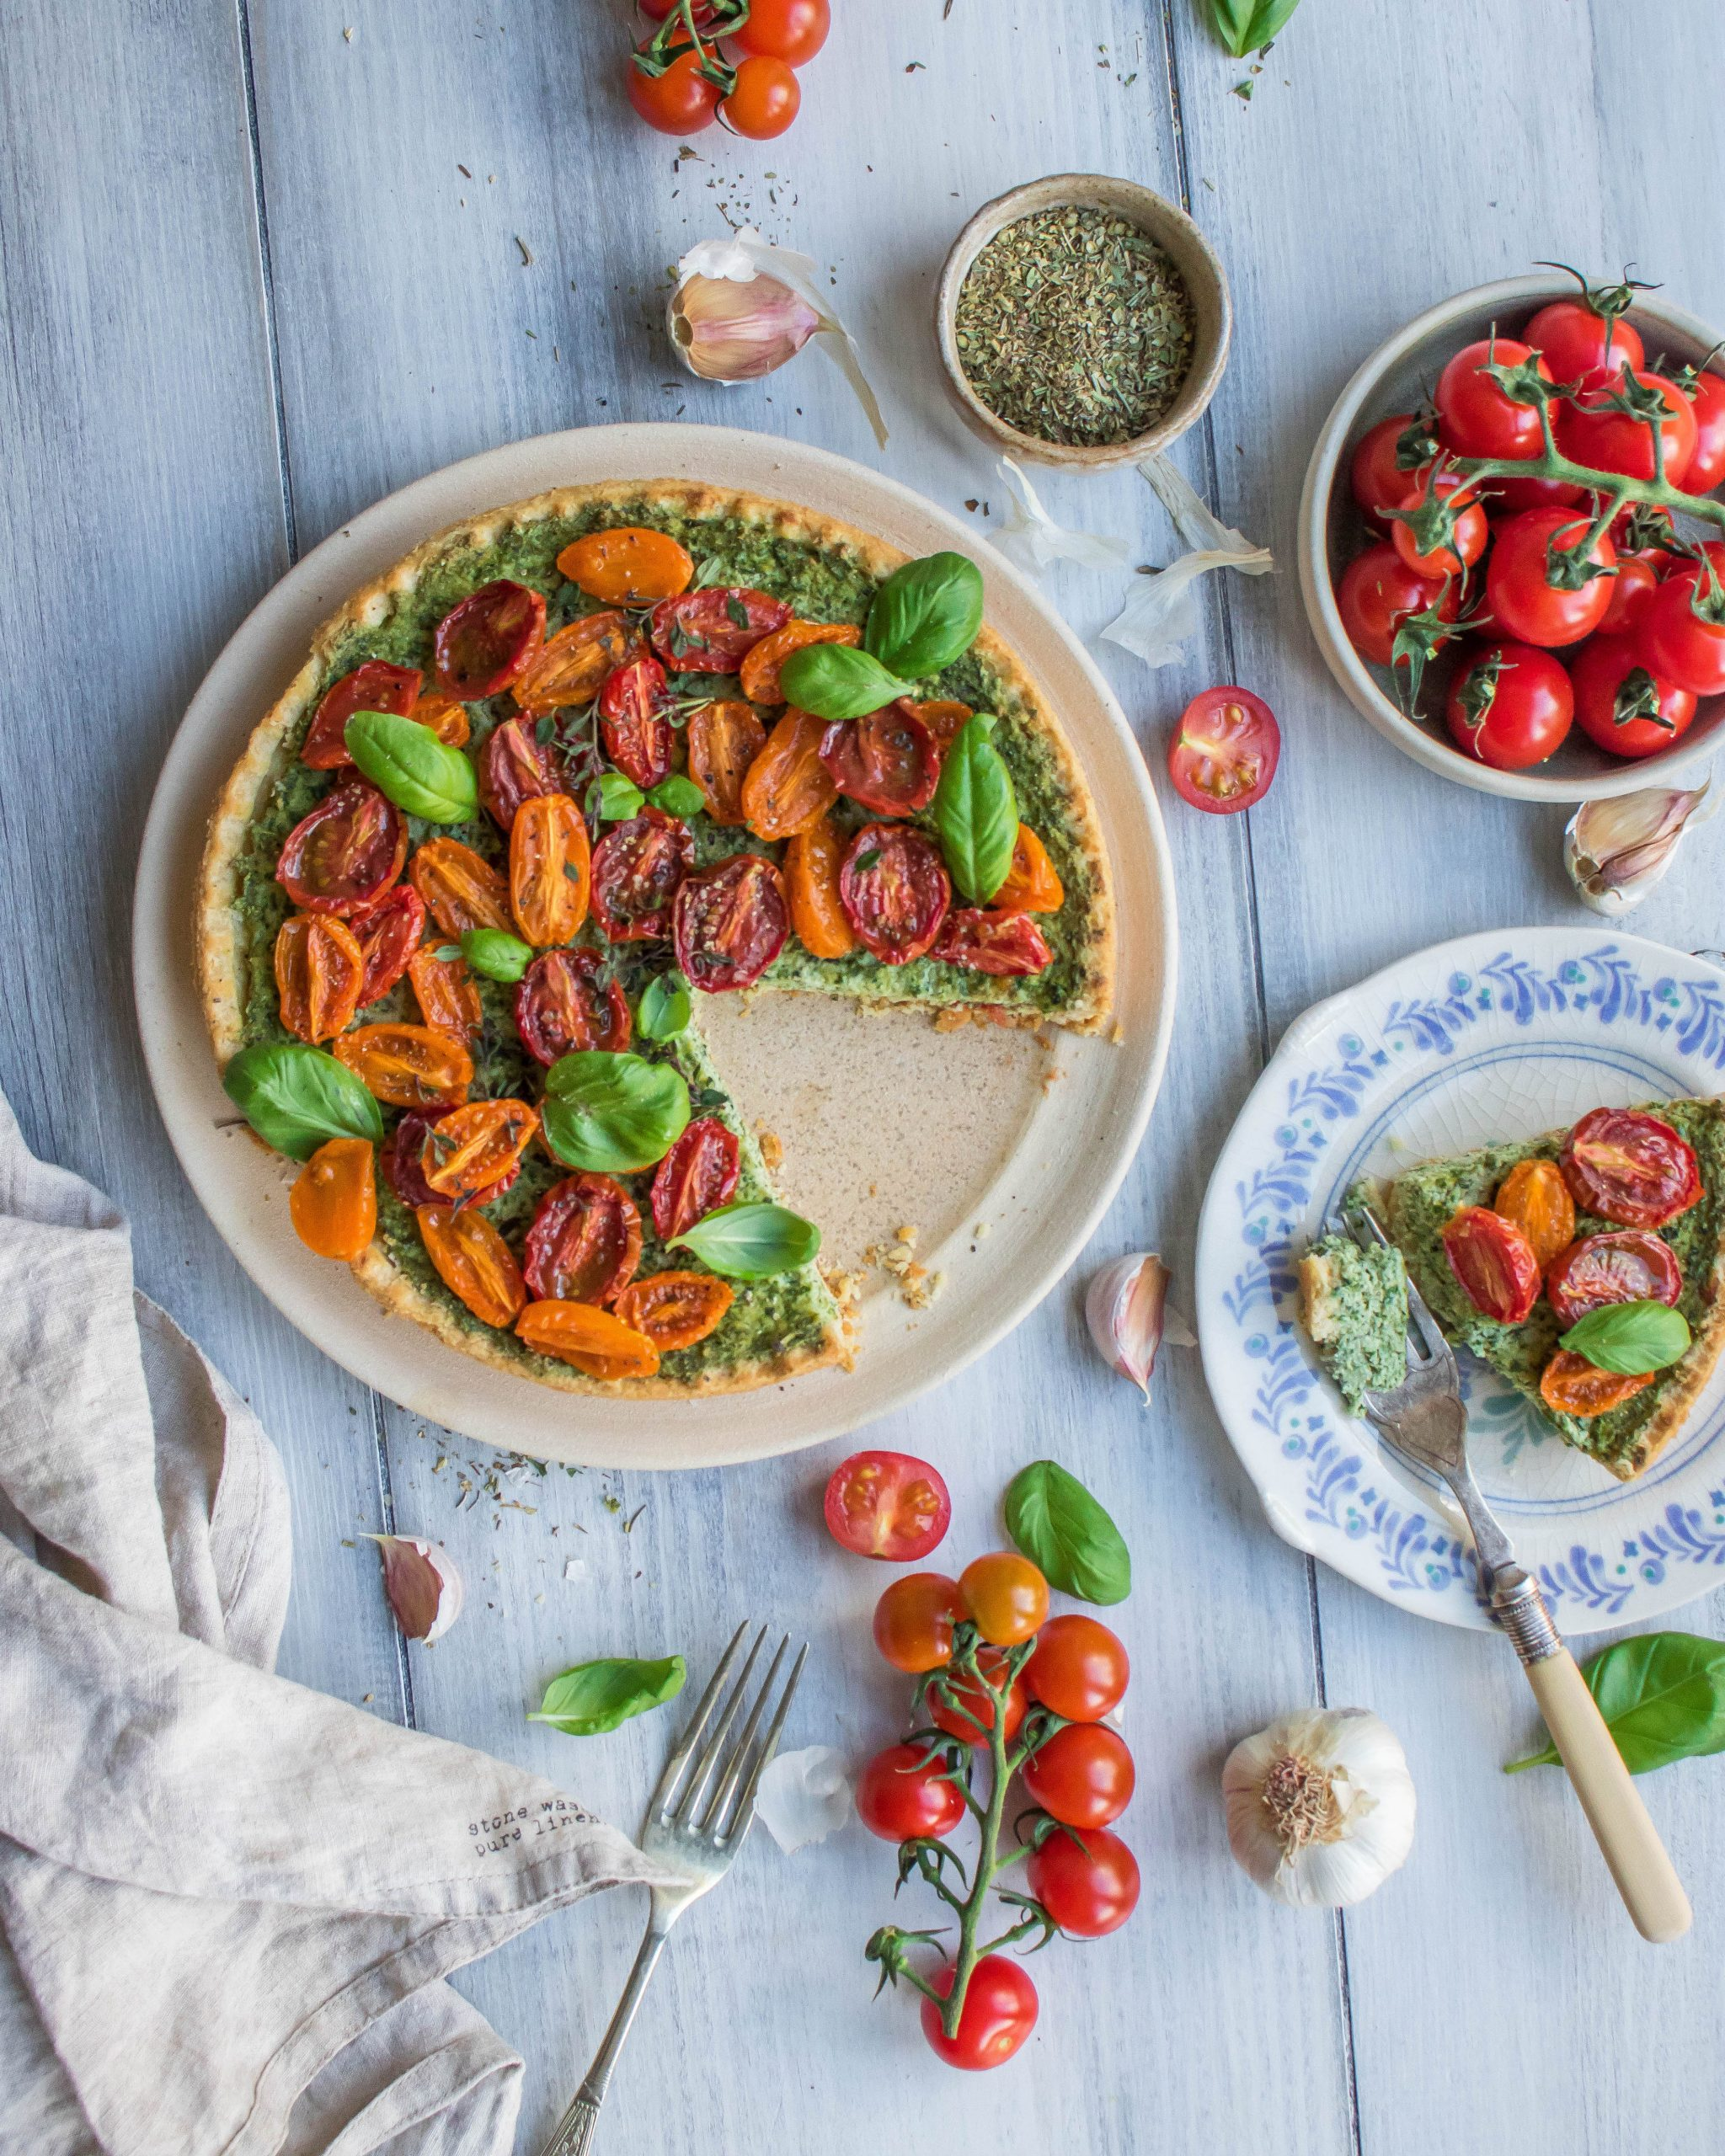 Kale & Cherry Tomato Tart